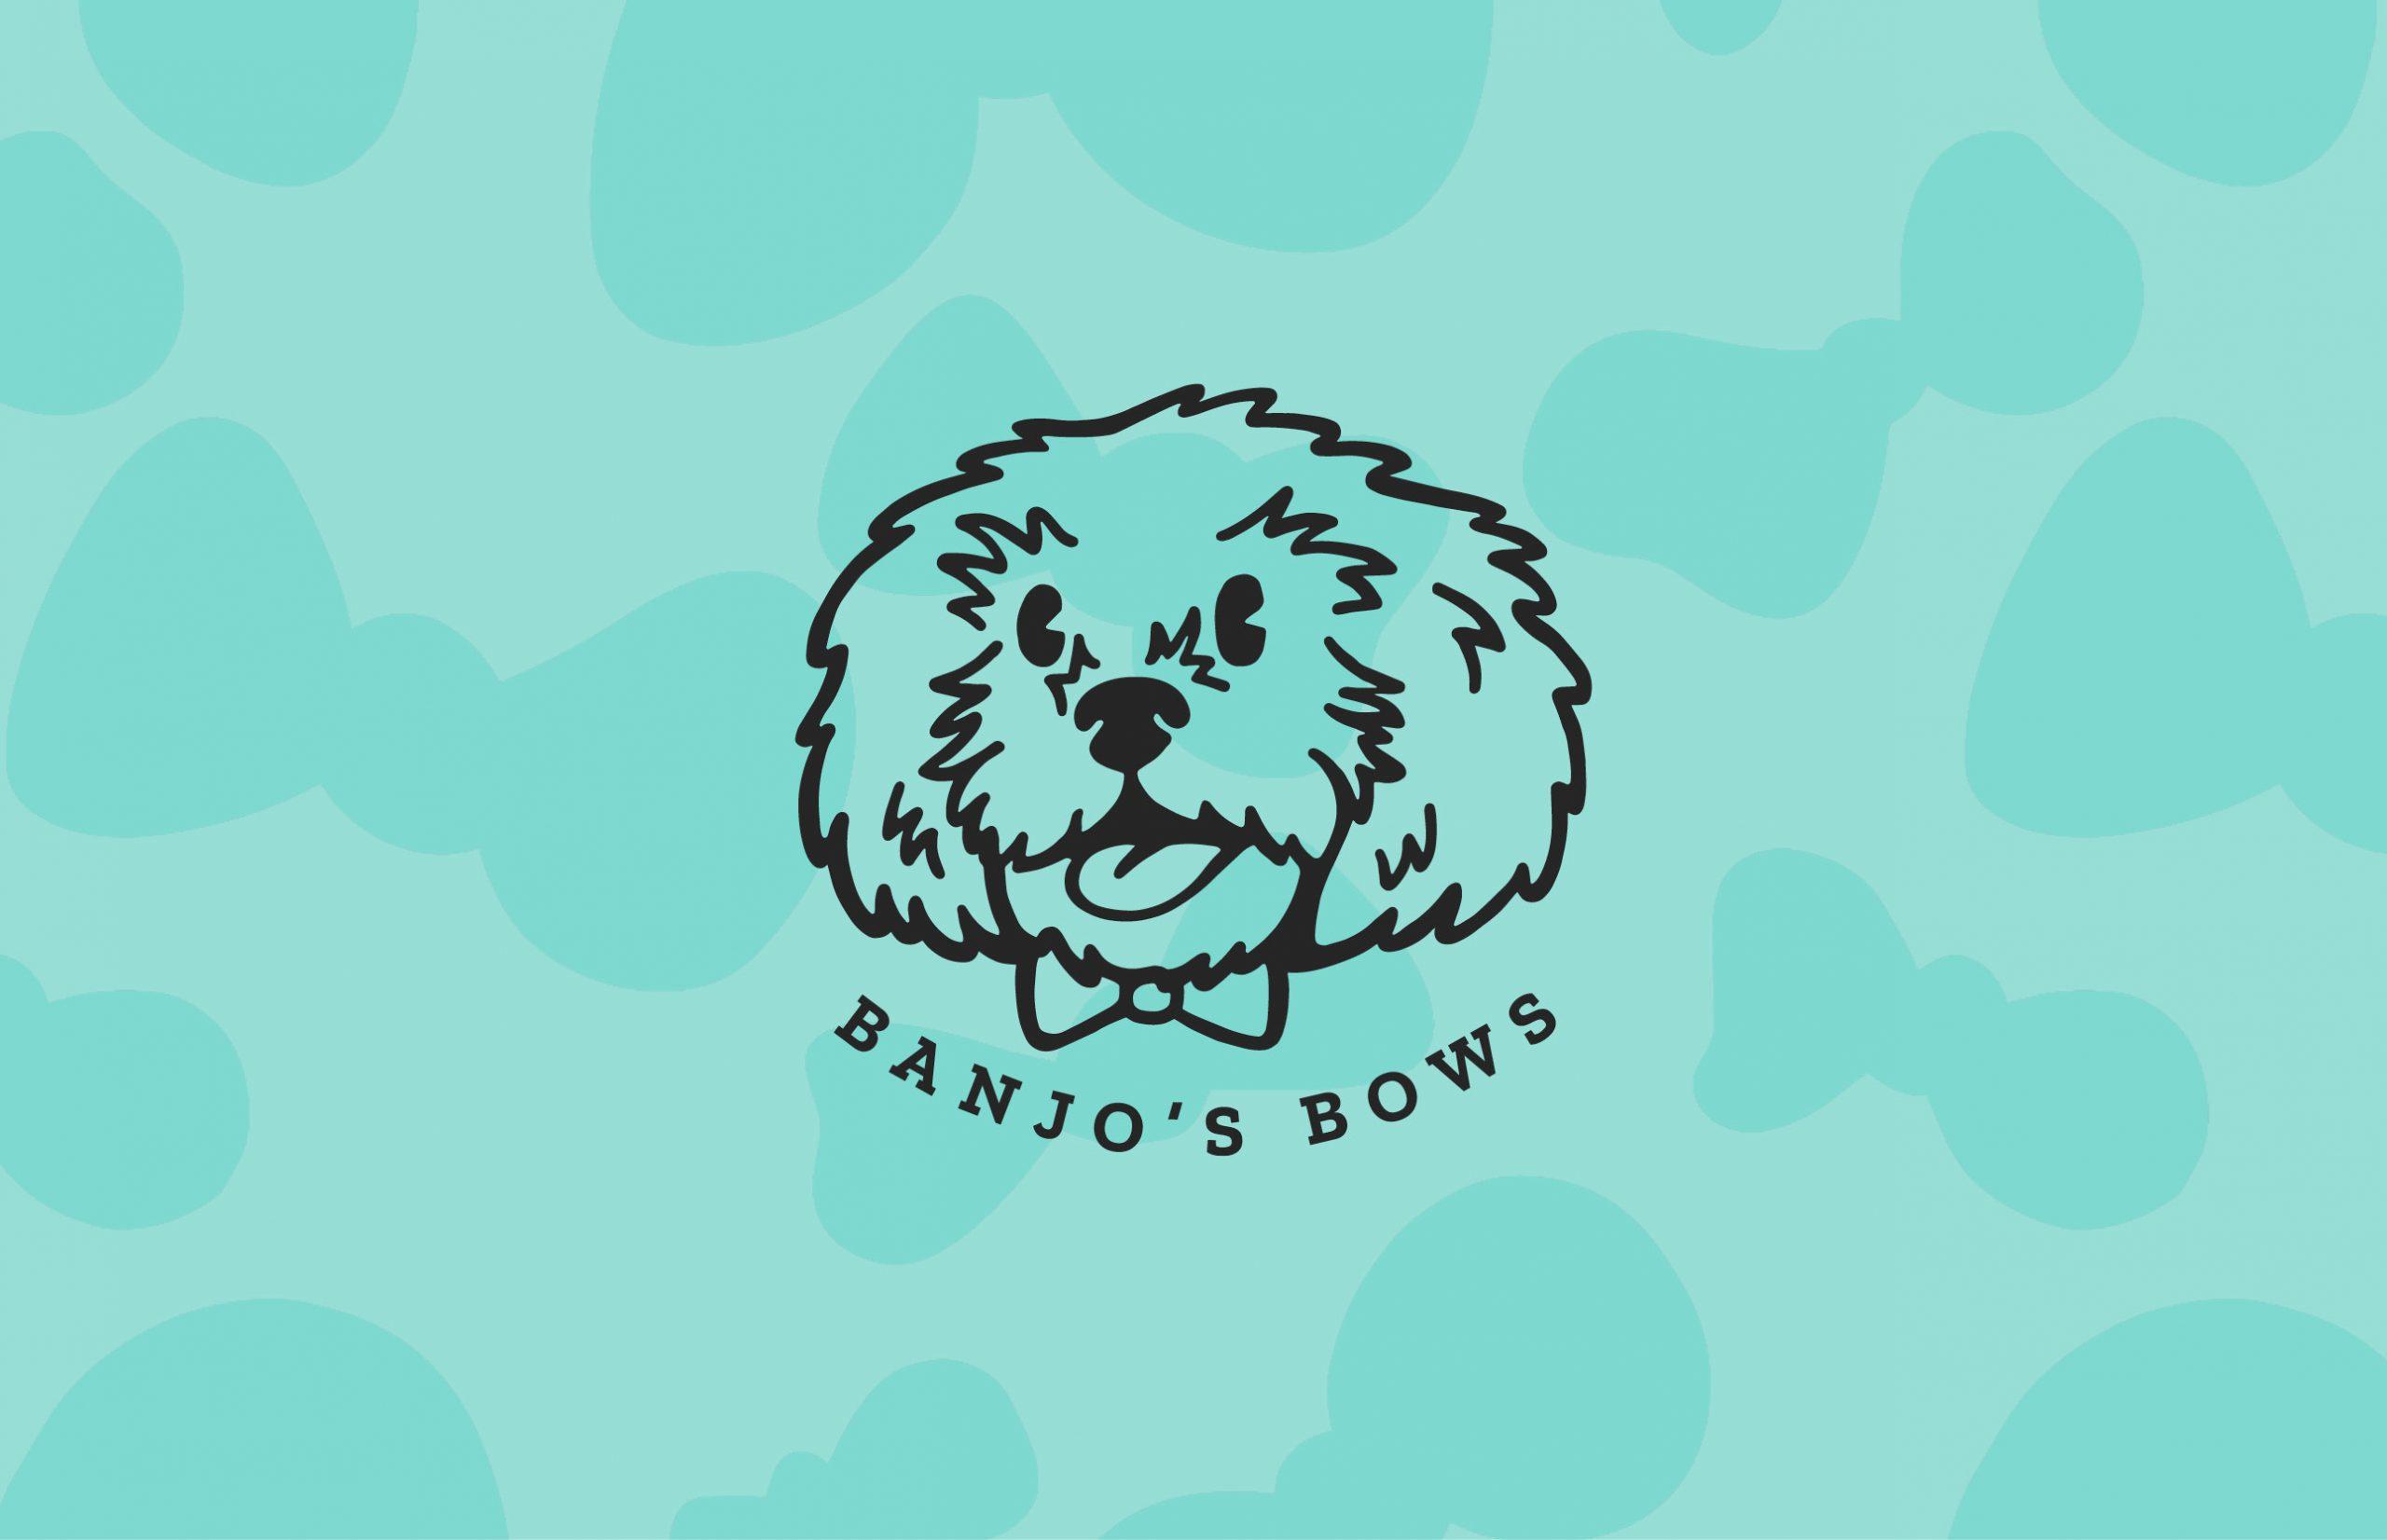 Banjos Bows logo